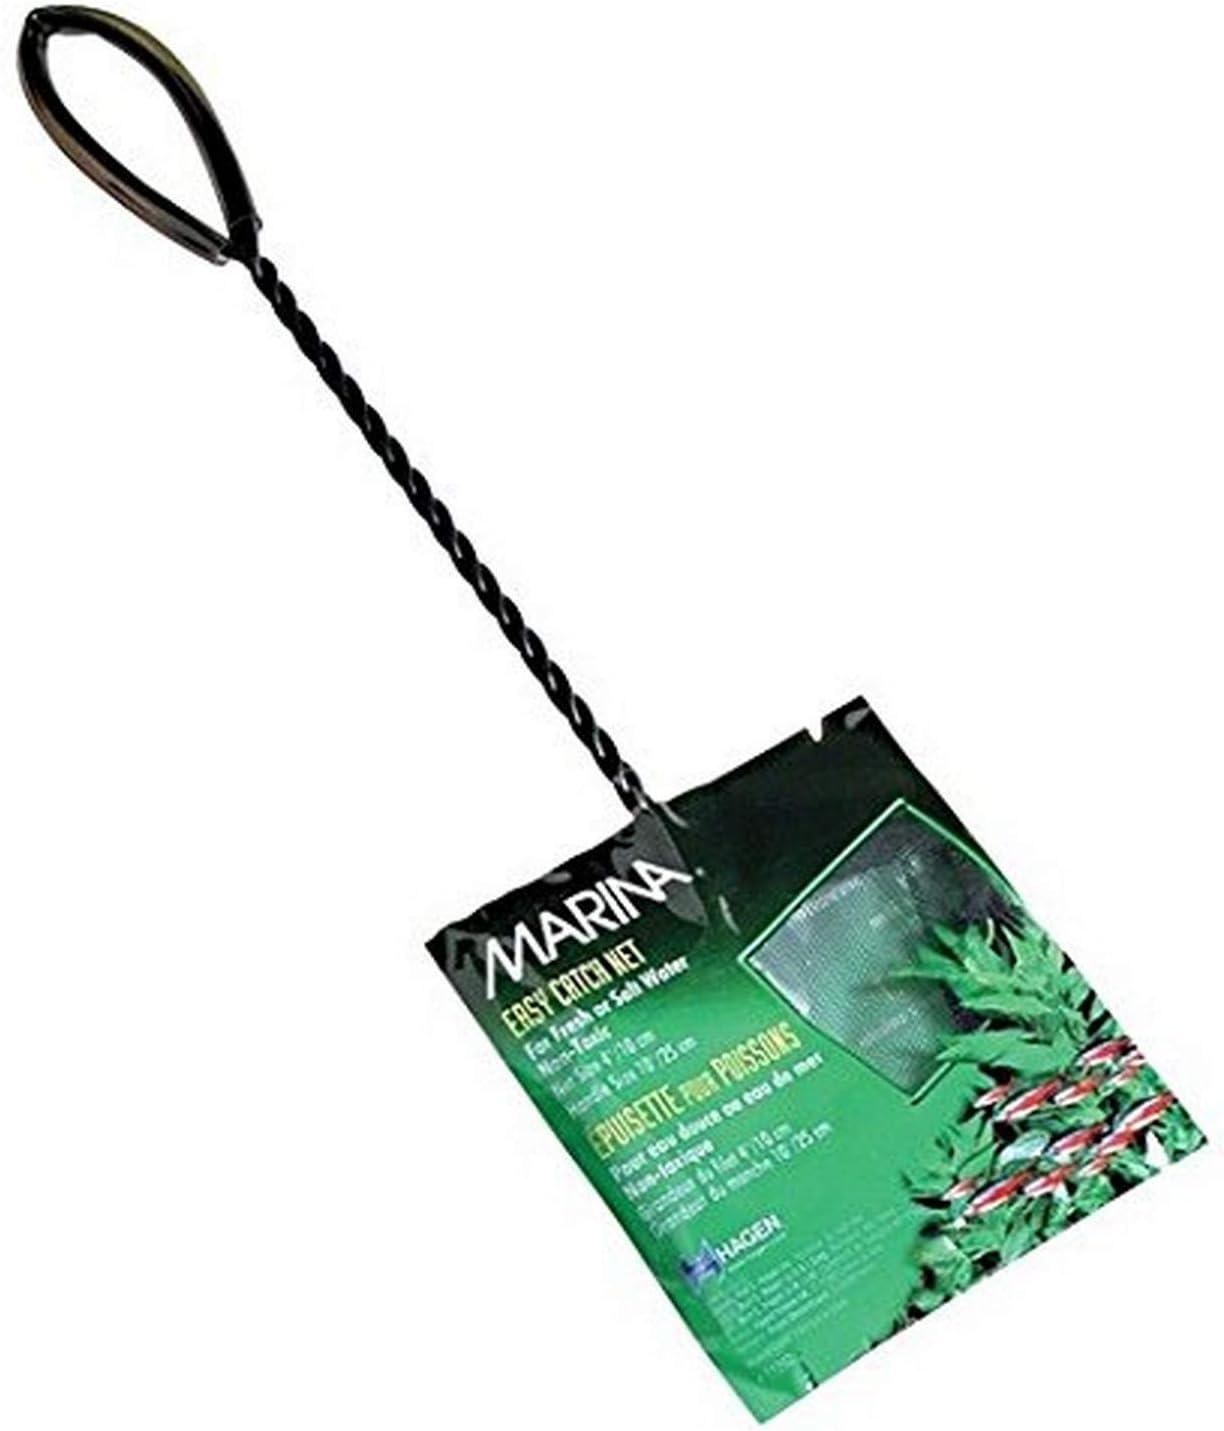 Marina 2 Inch Black Coarse Nylon with 10 Inch Handle